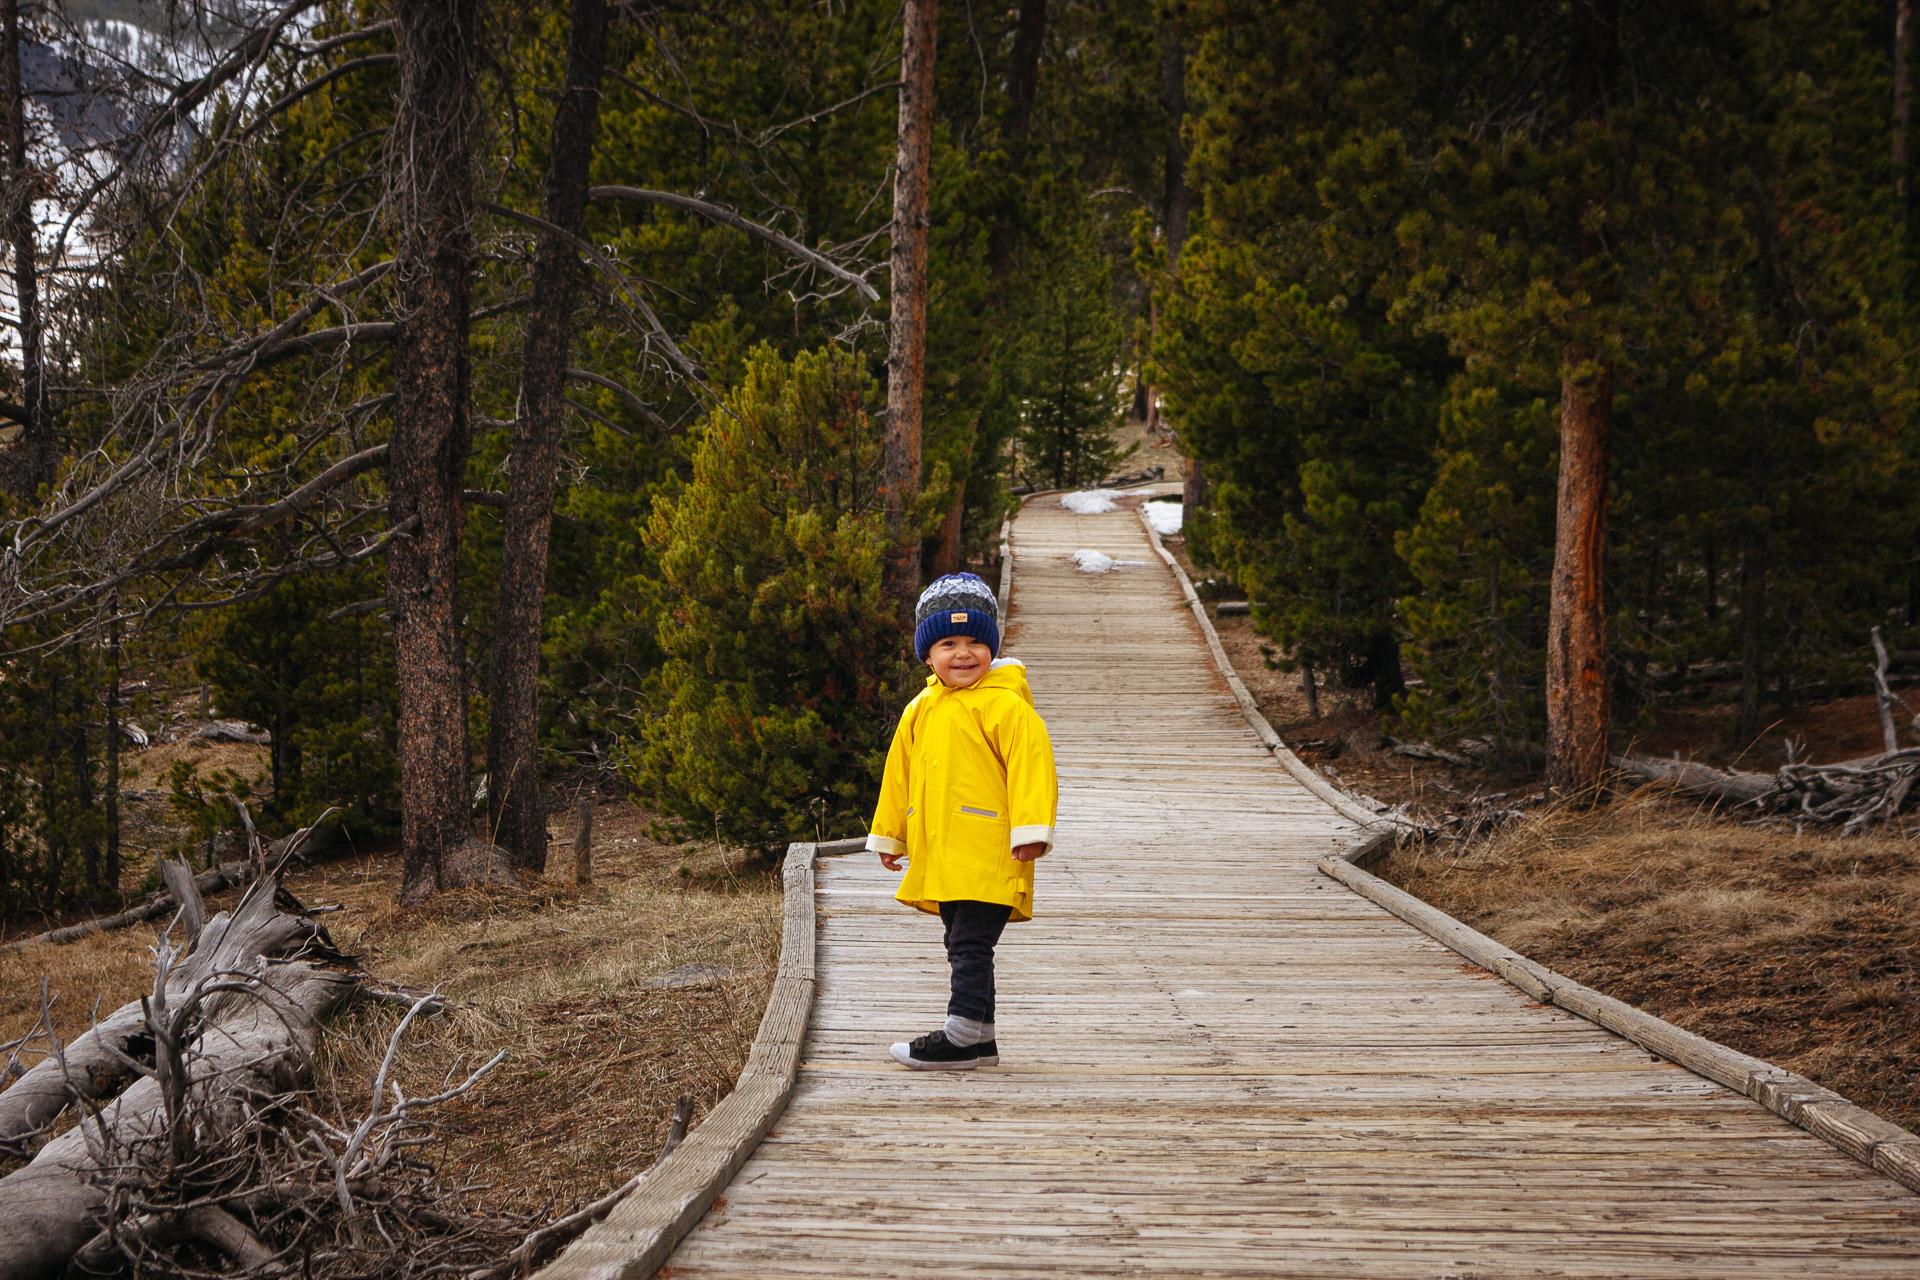 yellowstone park, Yellowstone